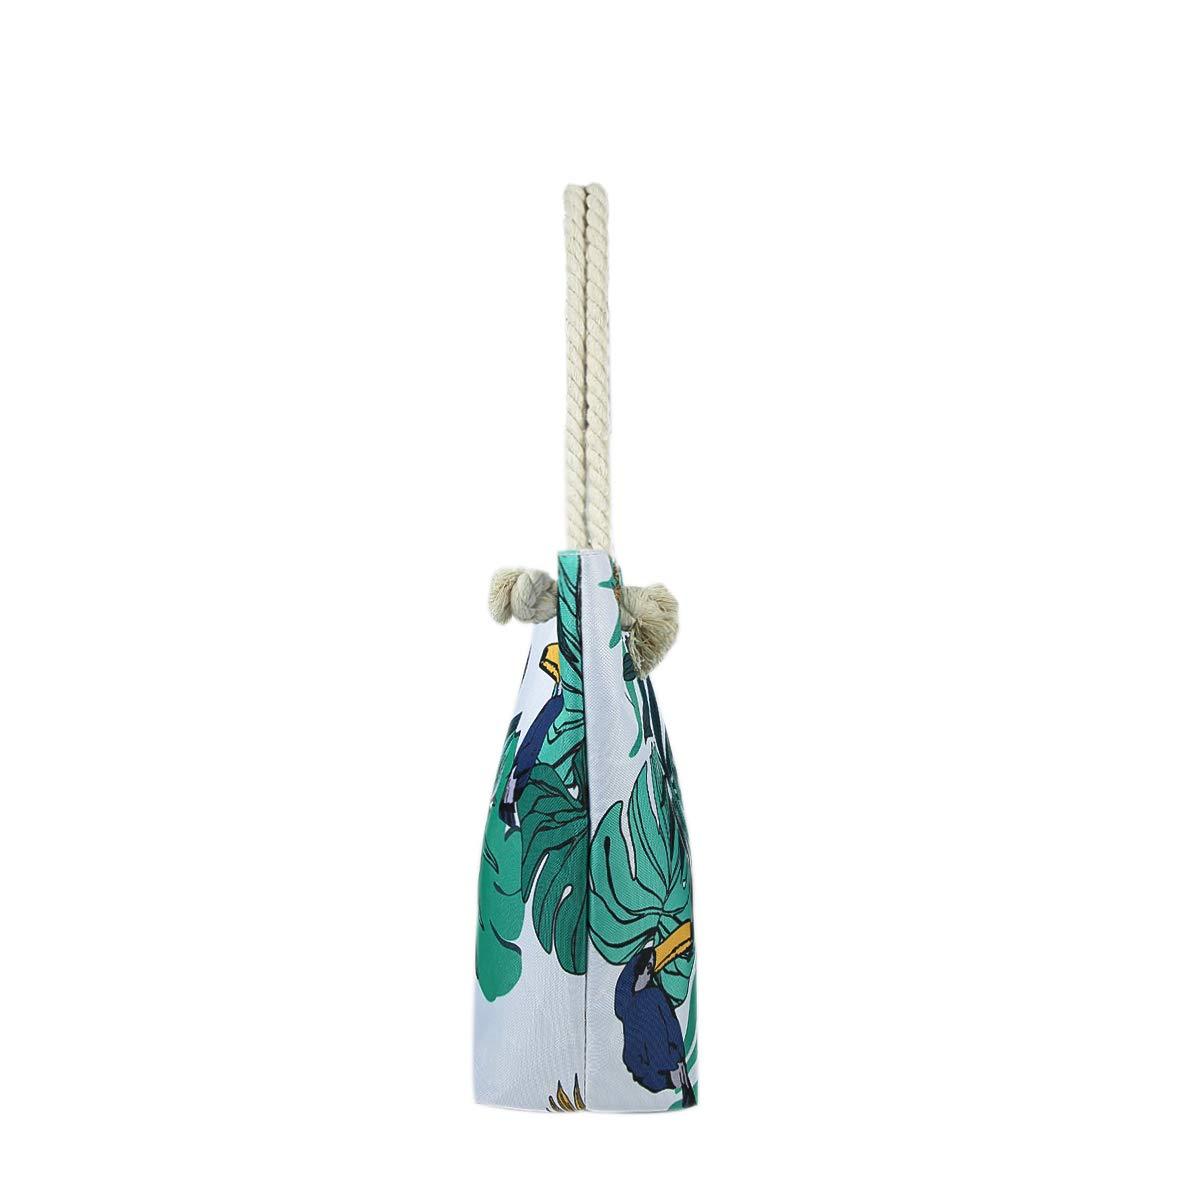 23 Large Tote Beach Shoulder Handbag for Women Extra Large Waterproof Canvas Tote Bag for Ladies Jingmu Beach Bag for Women